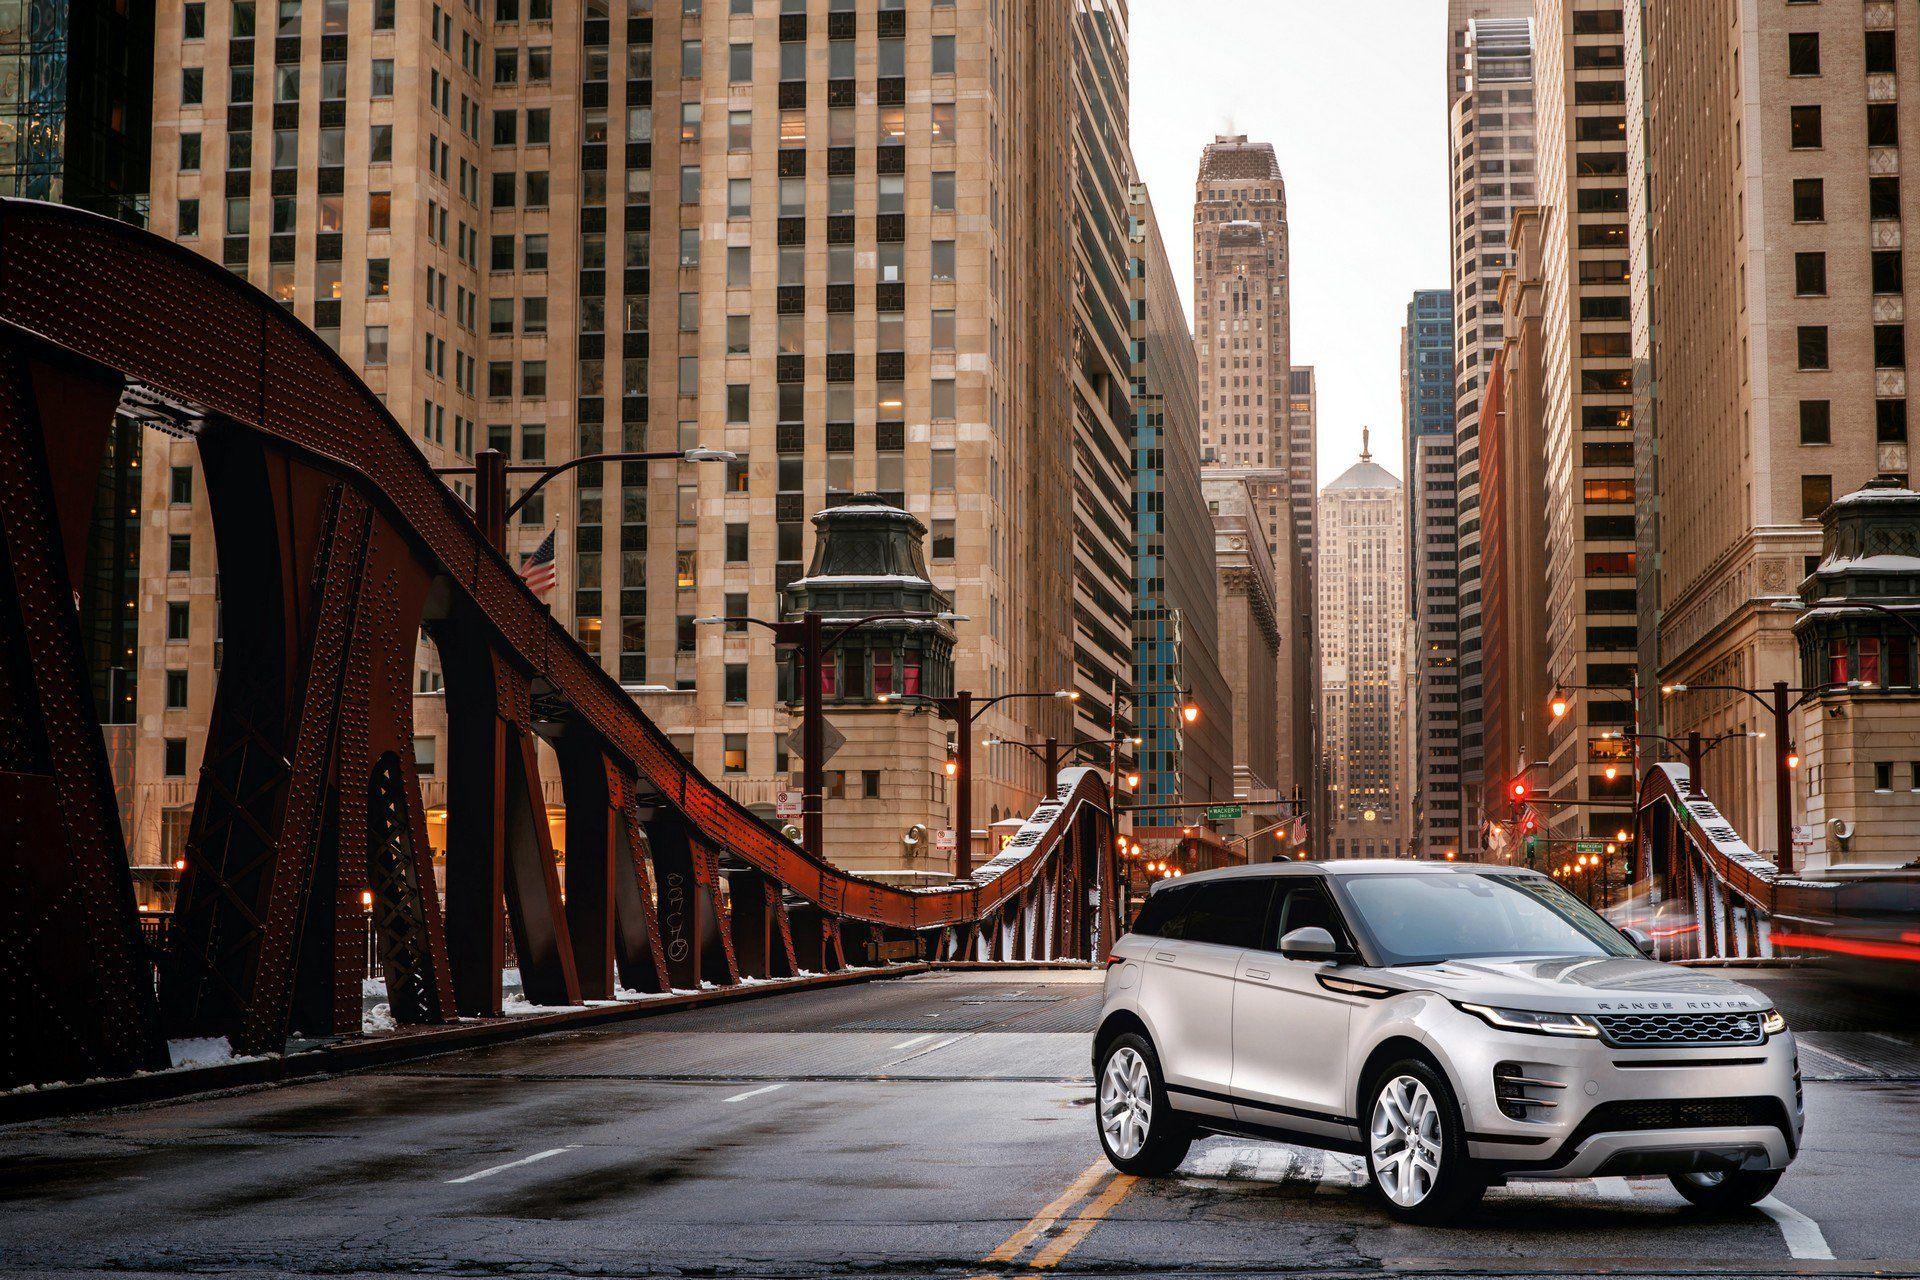 2020 Range Rover Evoque Gen 2 Lands In America For 42,650